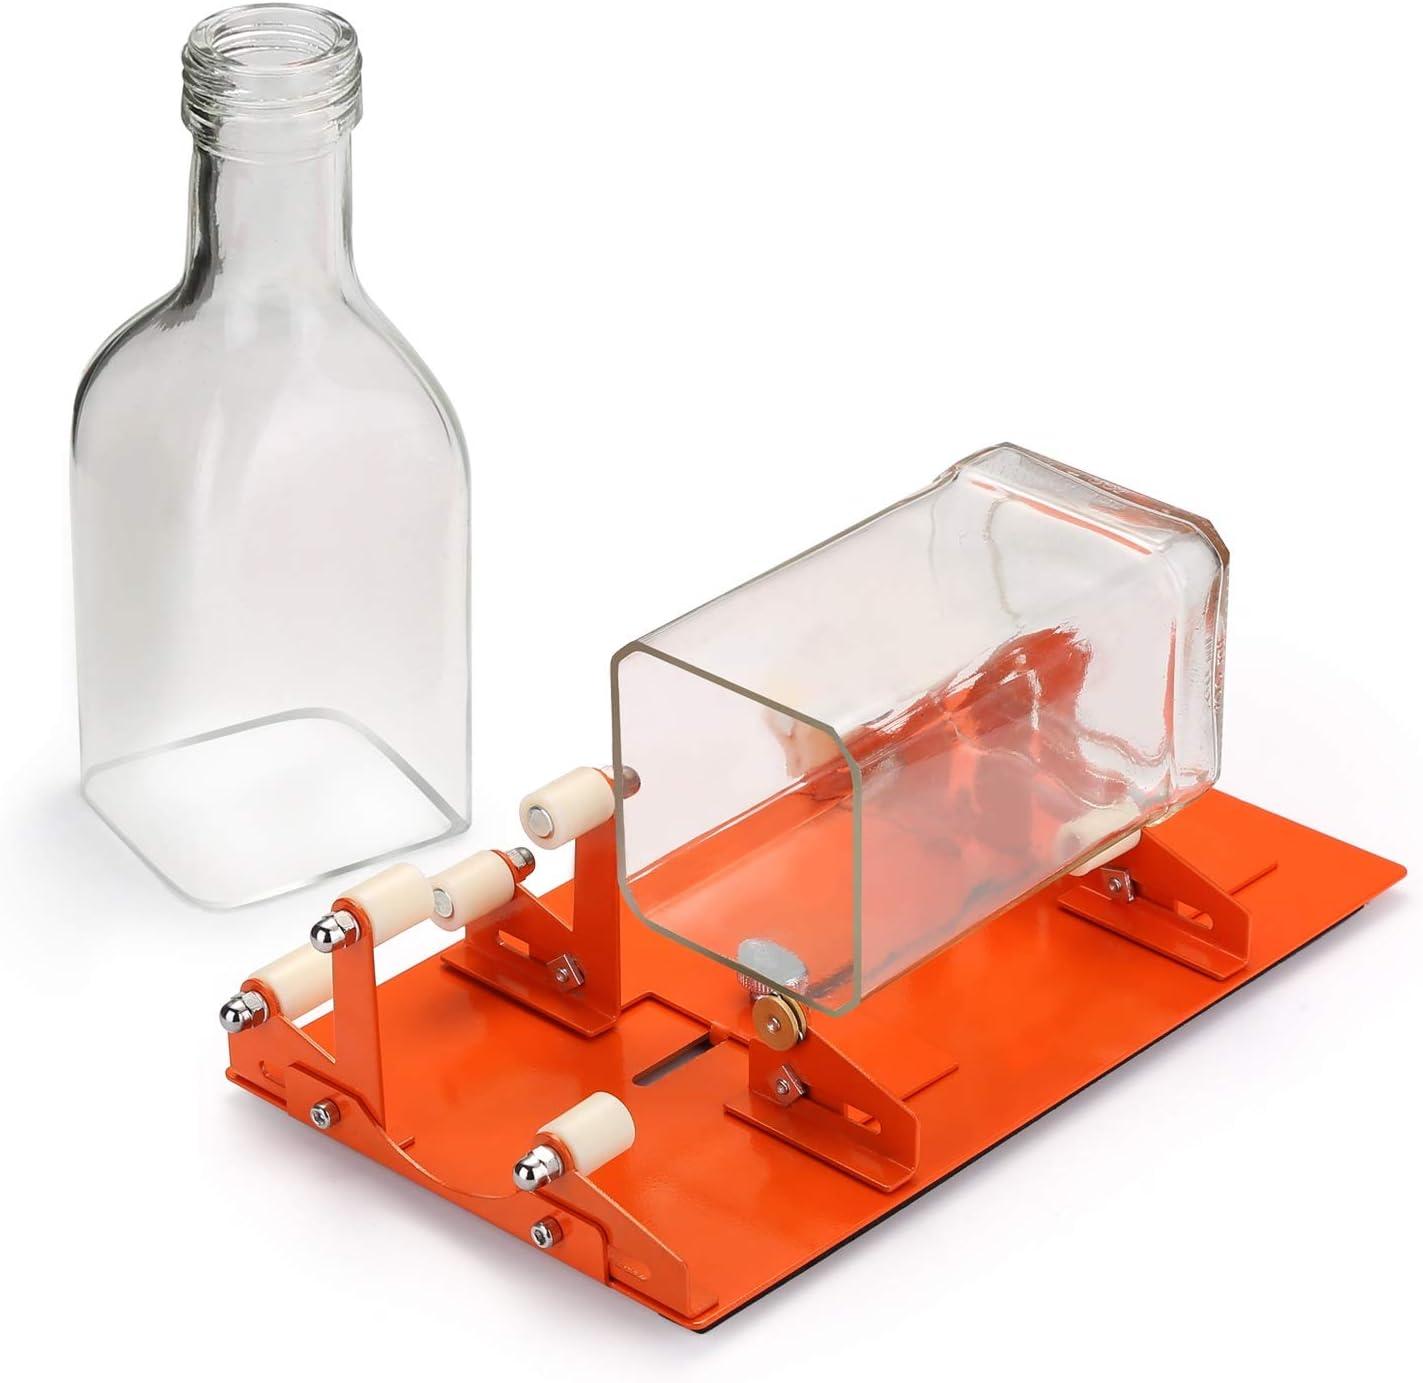 Maquina para cortar botellas de vidrio.